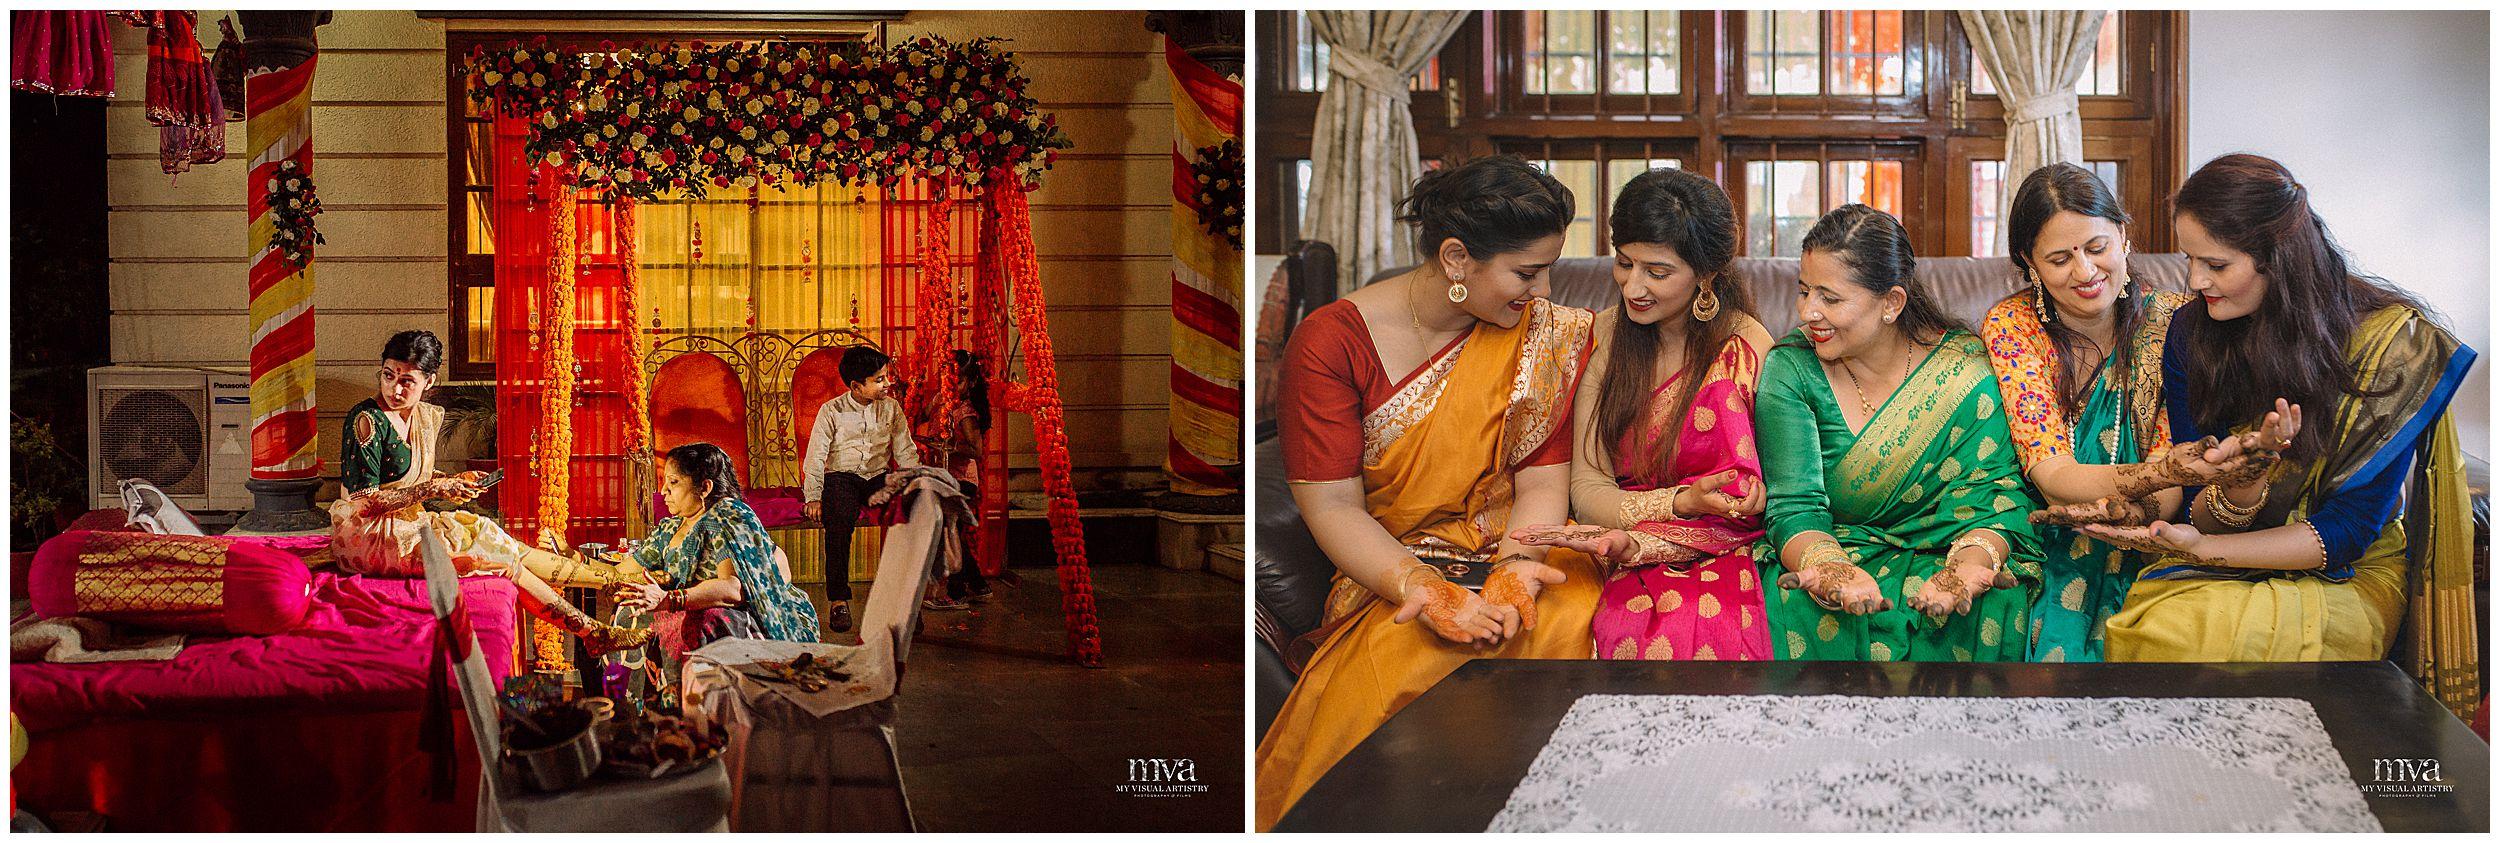 SONAAL_AMI_MYVISUALARTISTRY_WEDDING_PHOTOGRAPHY_MVA_NEPAL_KATHMANDU_SOALTEE5.jpg